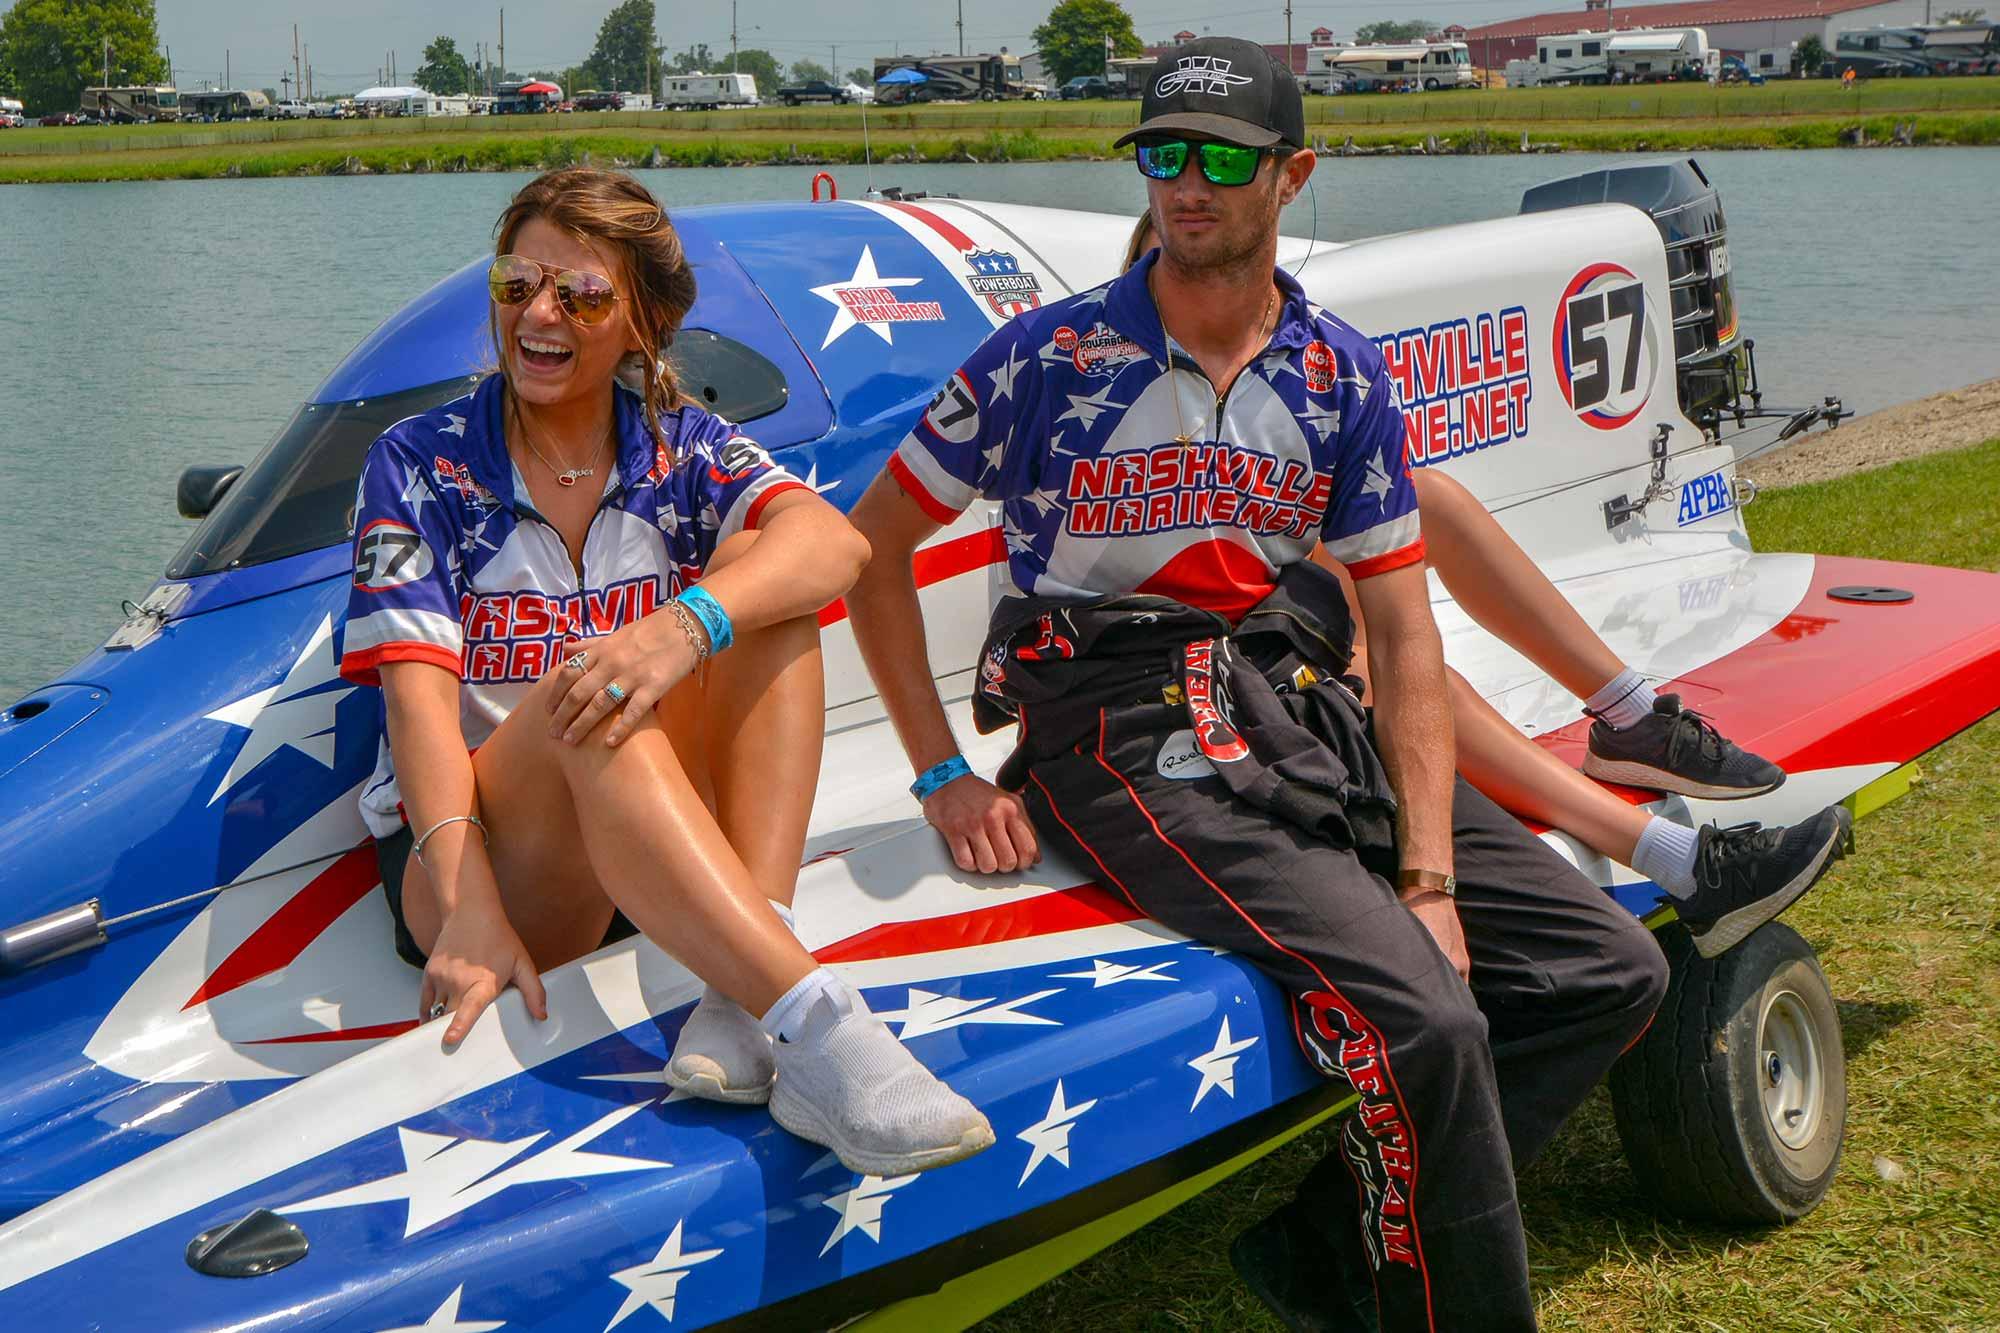 McMurray-Racing-Nashvill-Marine-2021-Springfield-F1-Race-46